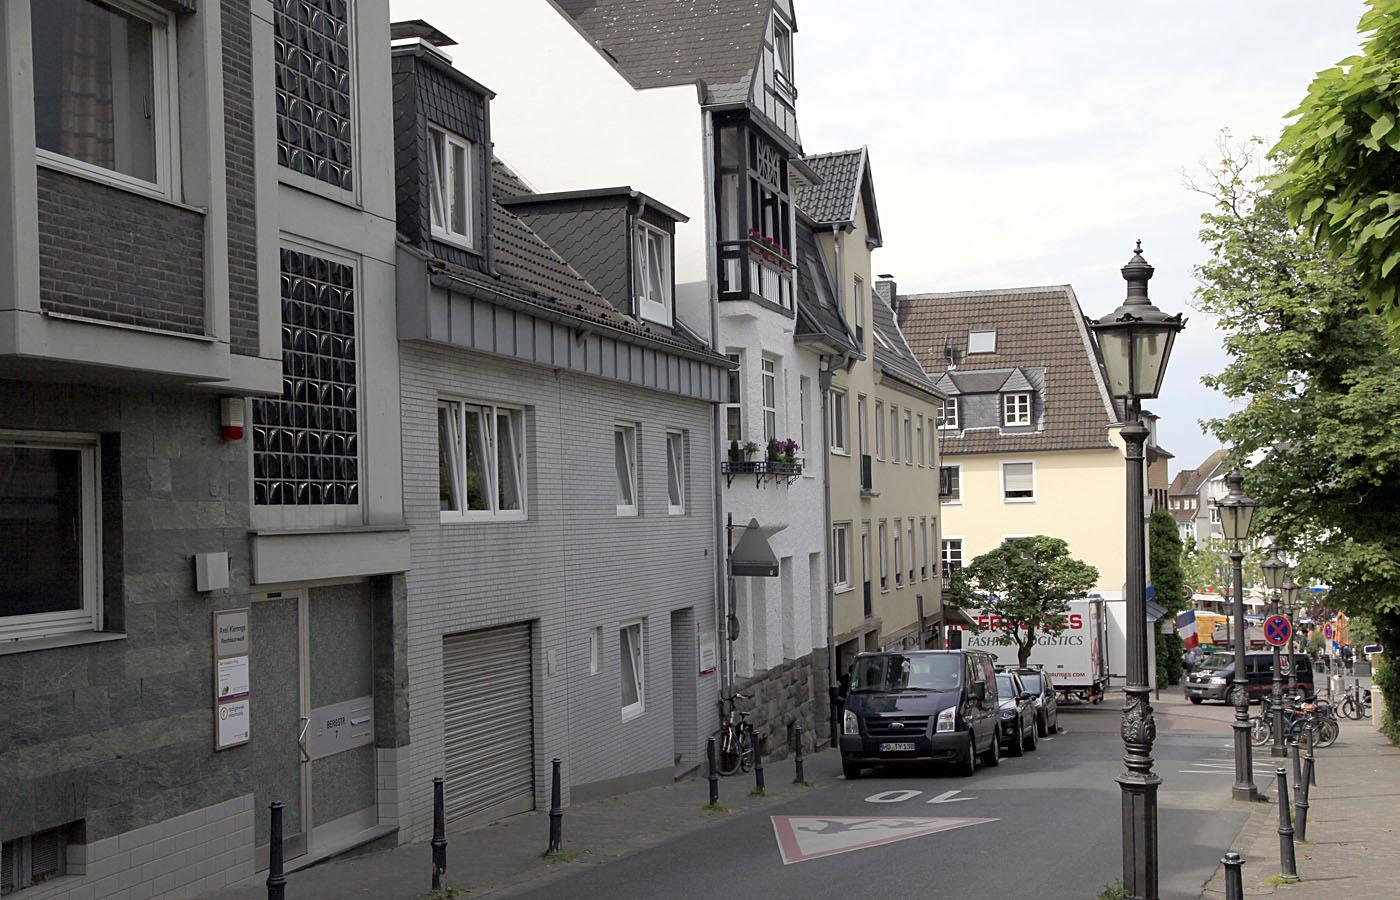 KFO-Praxis Am Michaelsberg in Siegburg